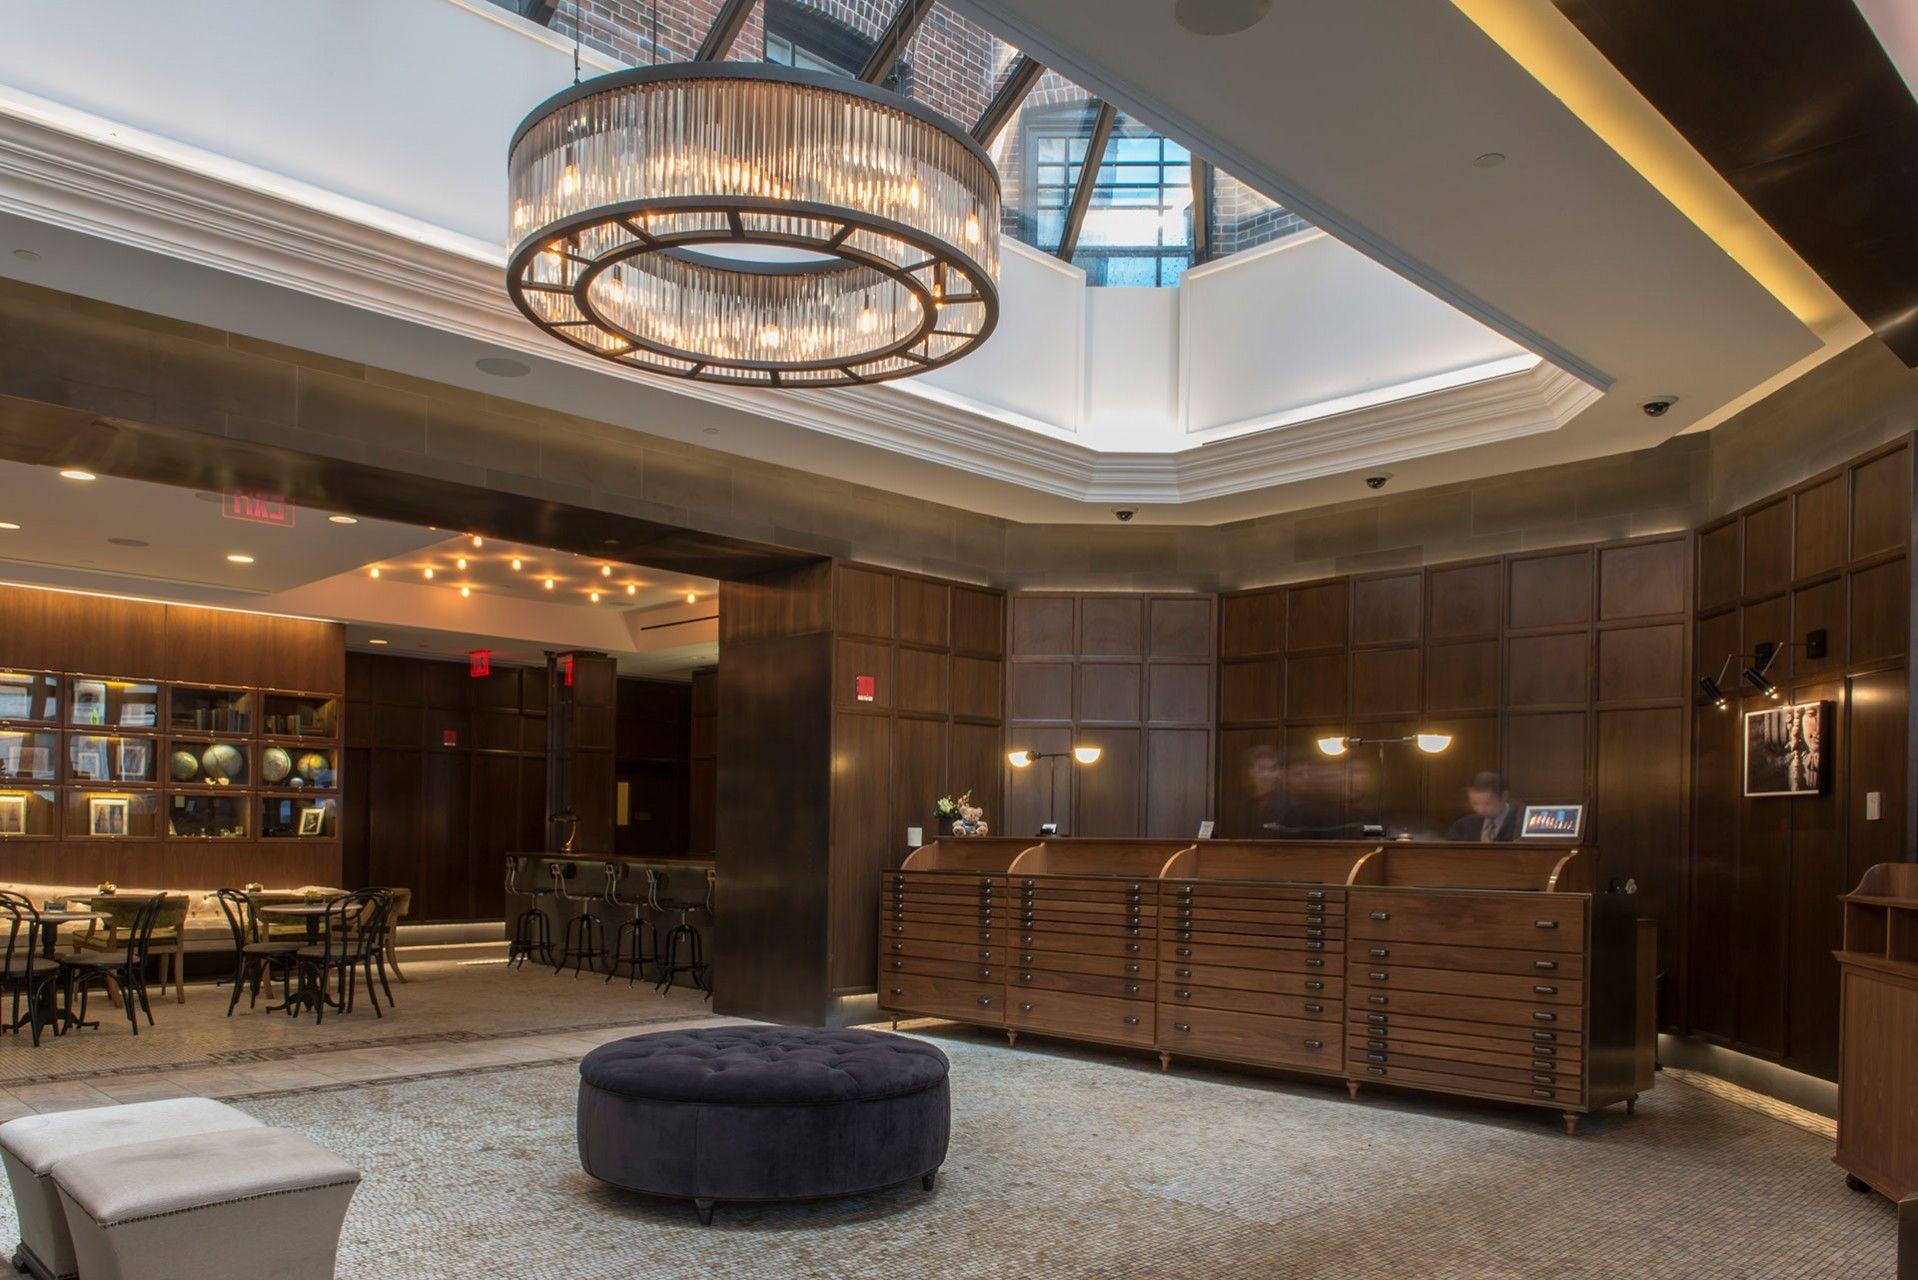 Hotel Belleclaire Hospitality Hospitality New York City Restaurant